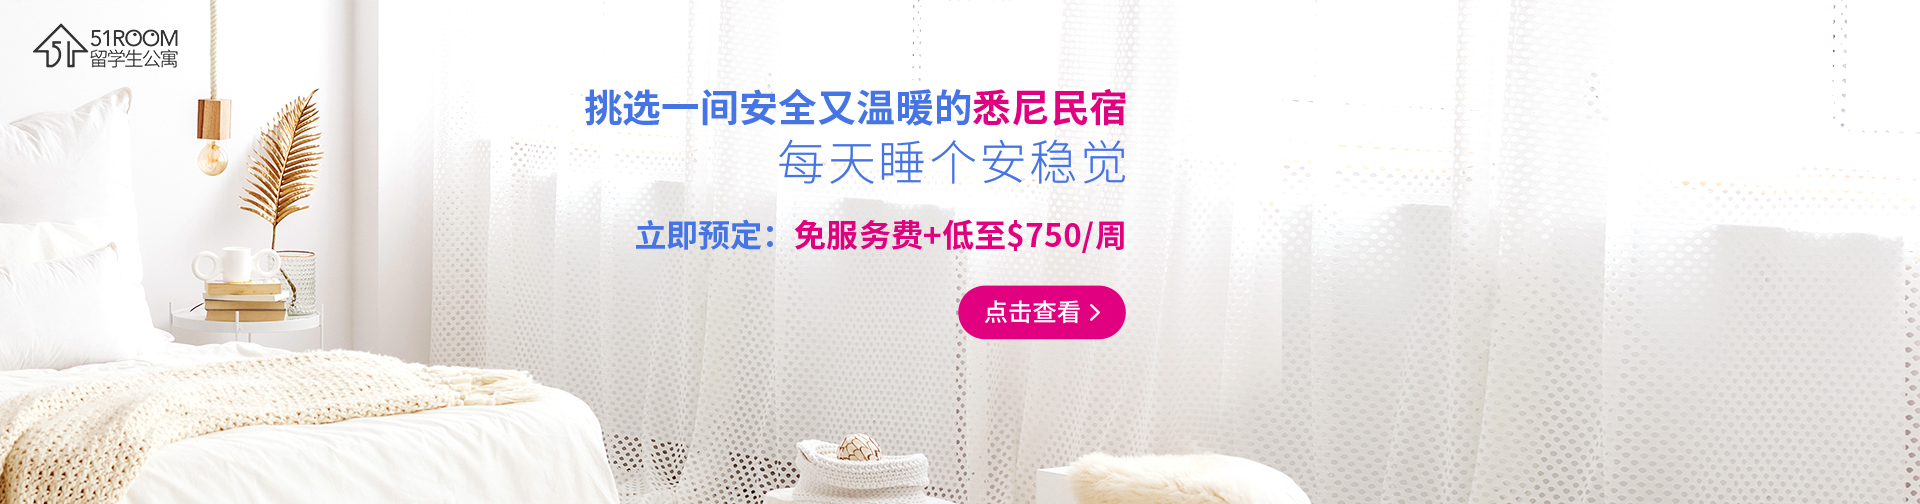 http://myoffer-public.oss-cn-shenzhen.aliyuncs.com/banners/66faa3b959e4e5b472a4857c5fa33721-579127-1920x504.jpeg